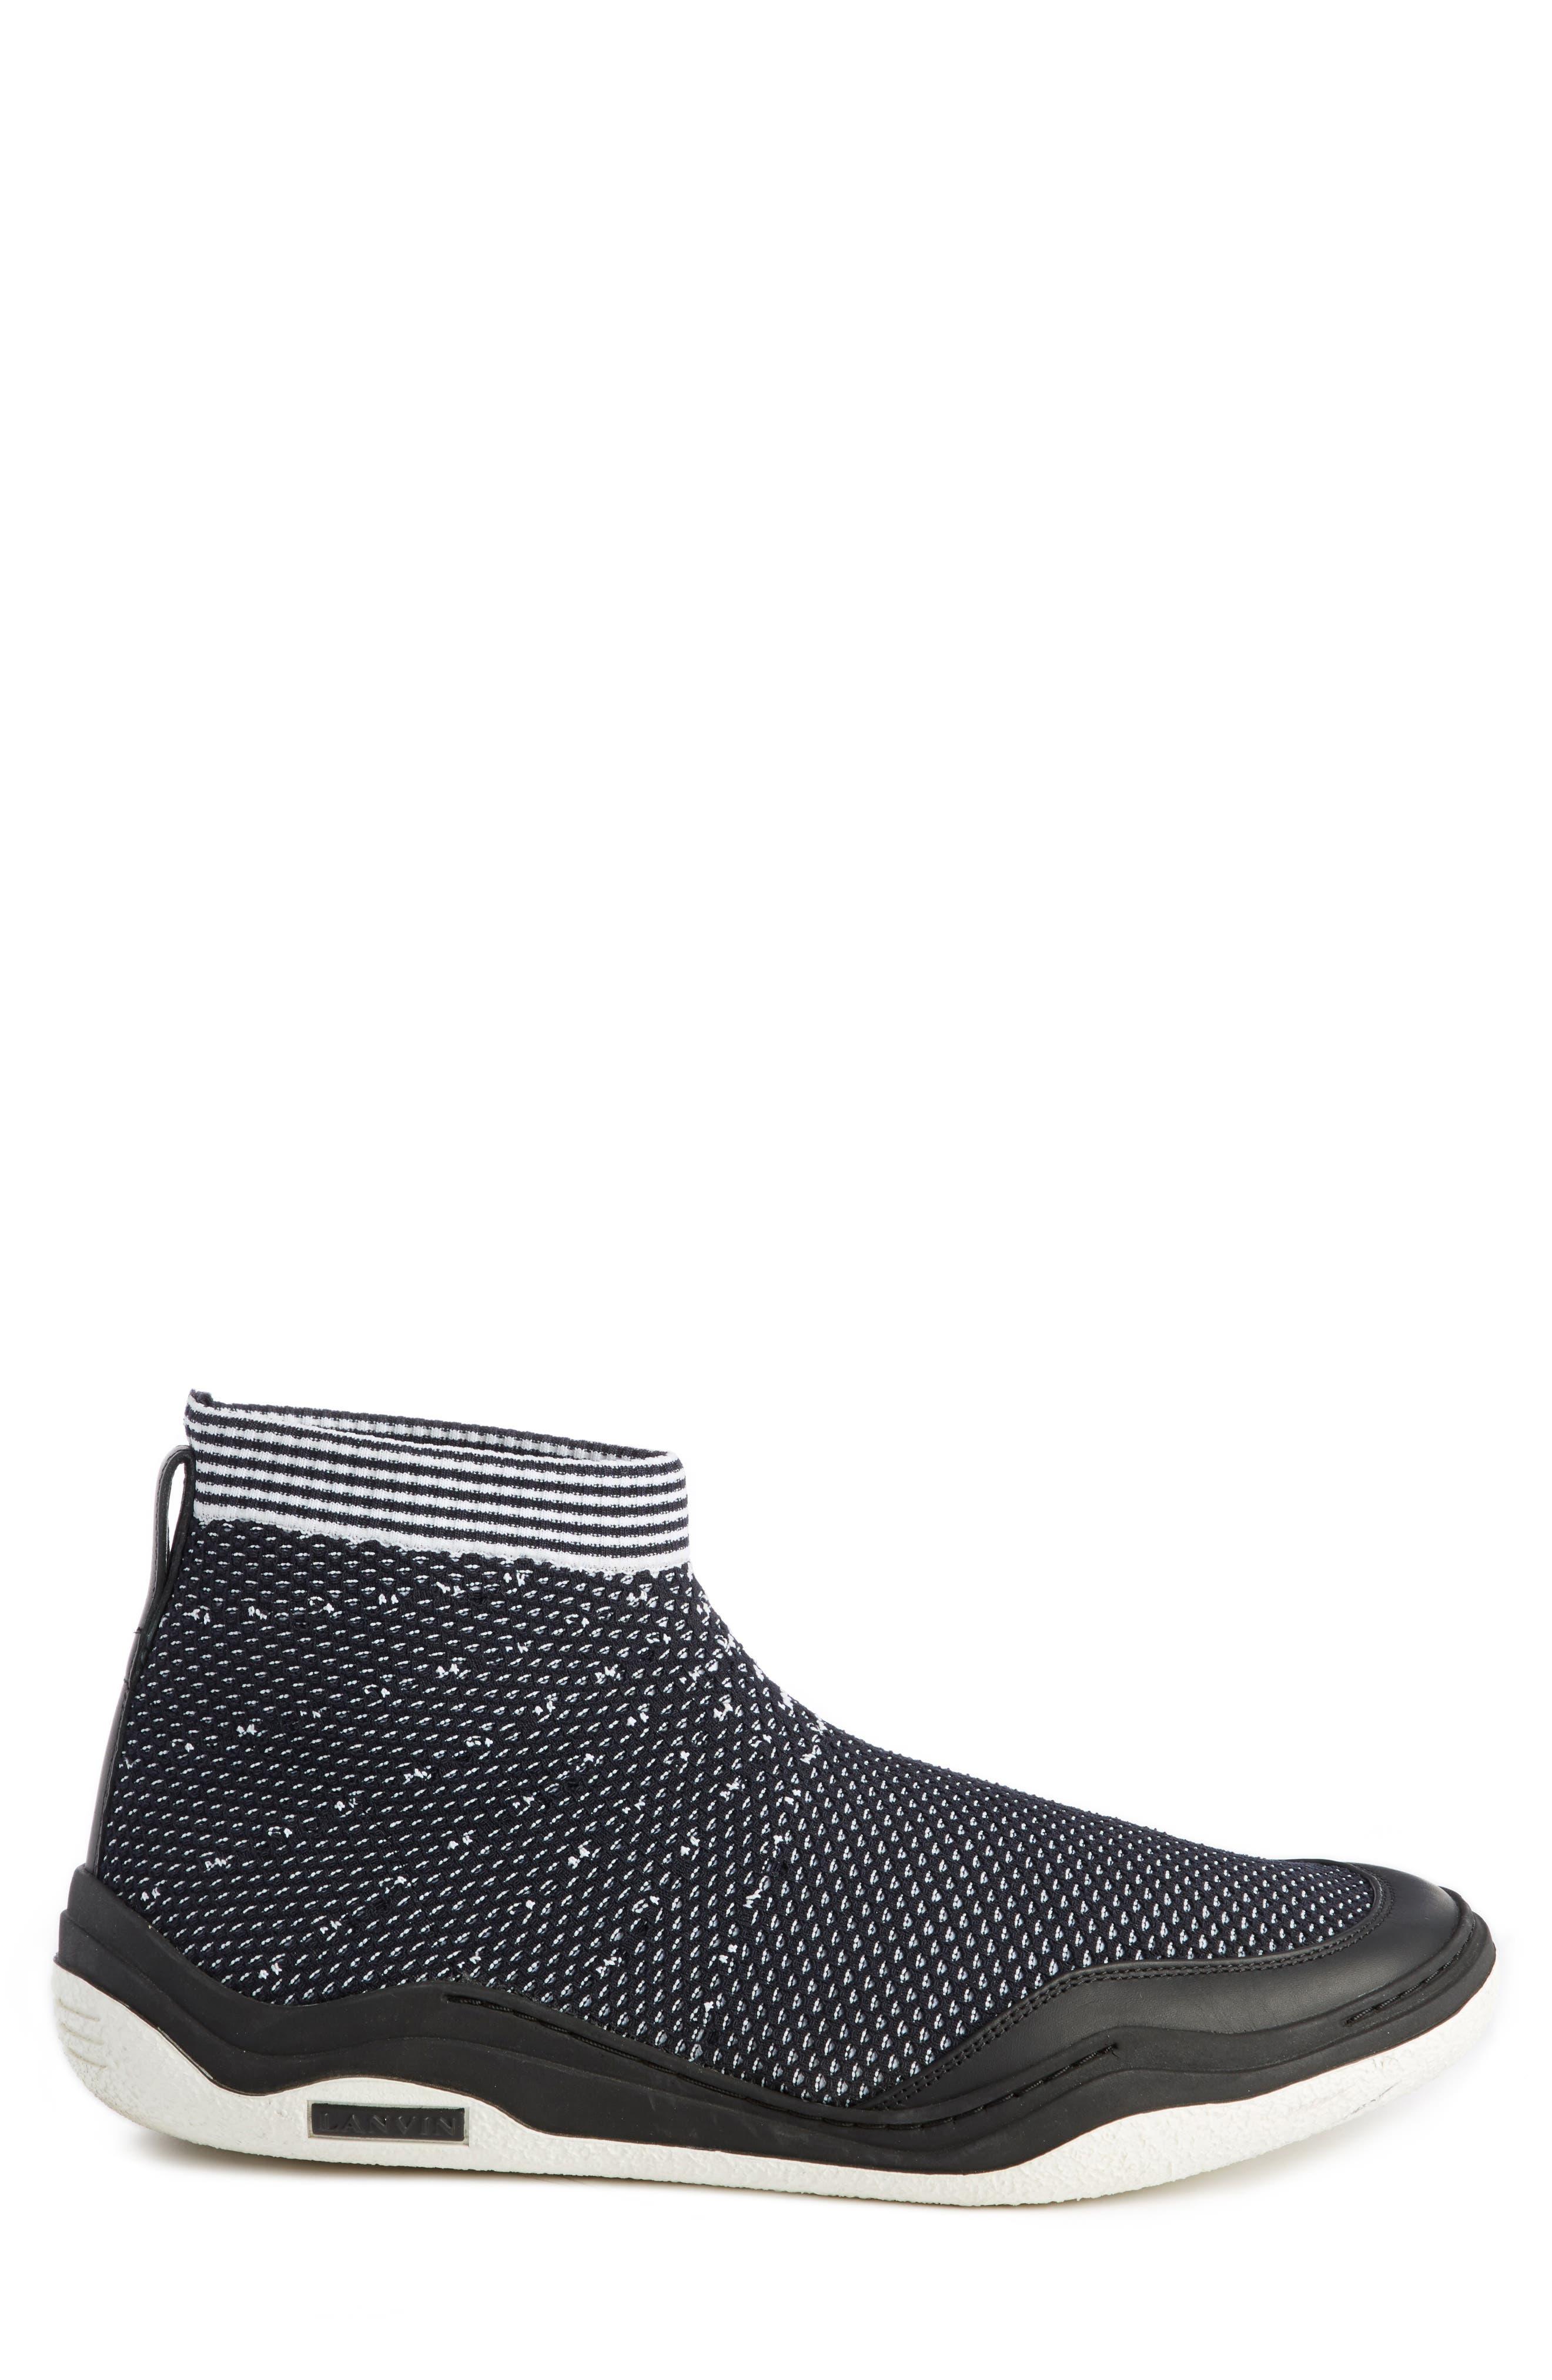 Knit Sneaker,                             Alternate thumbnail 4, color,                             004